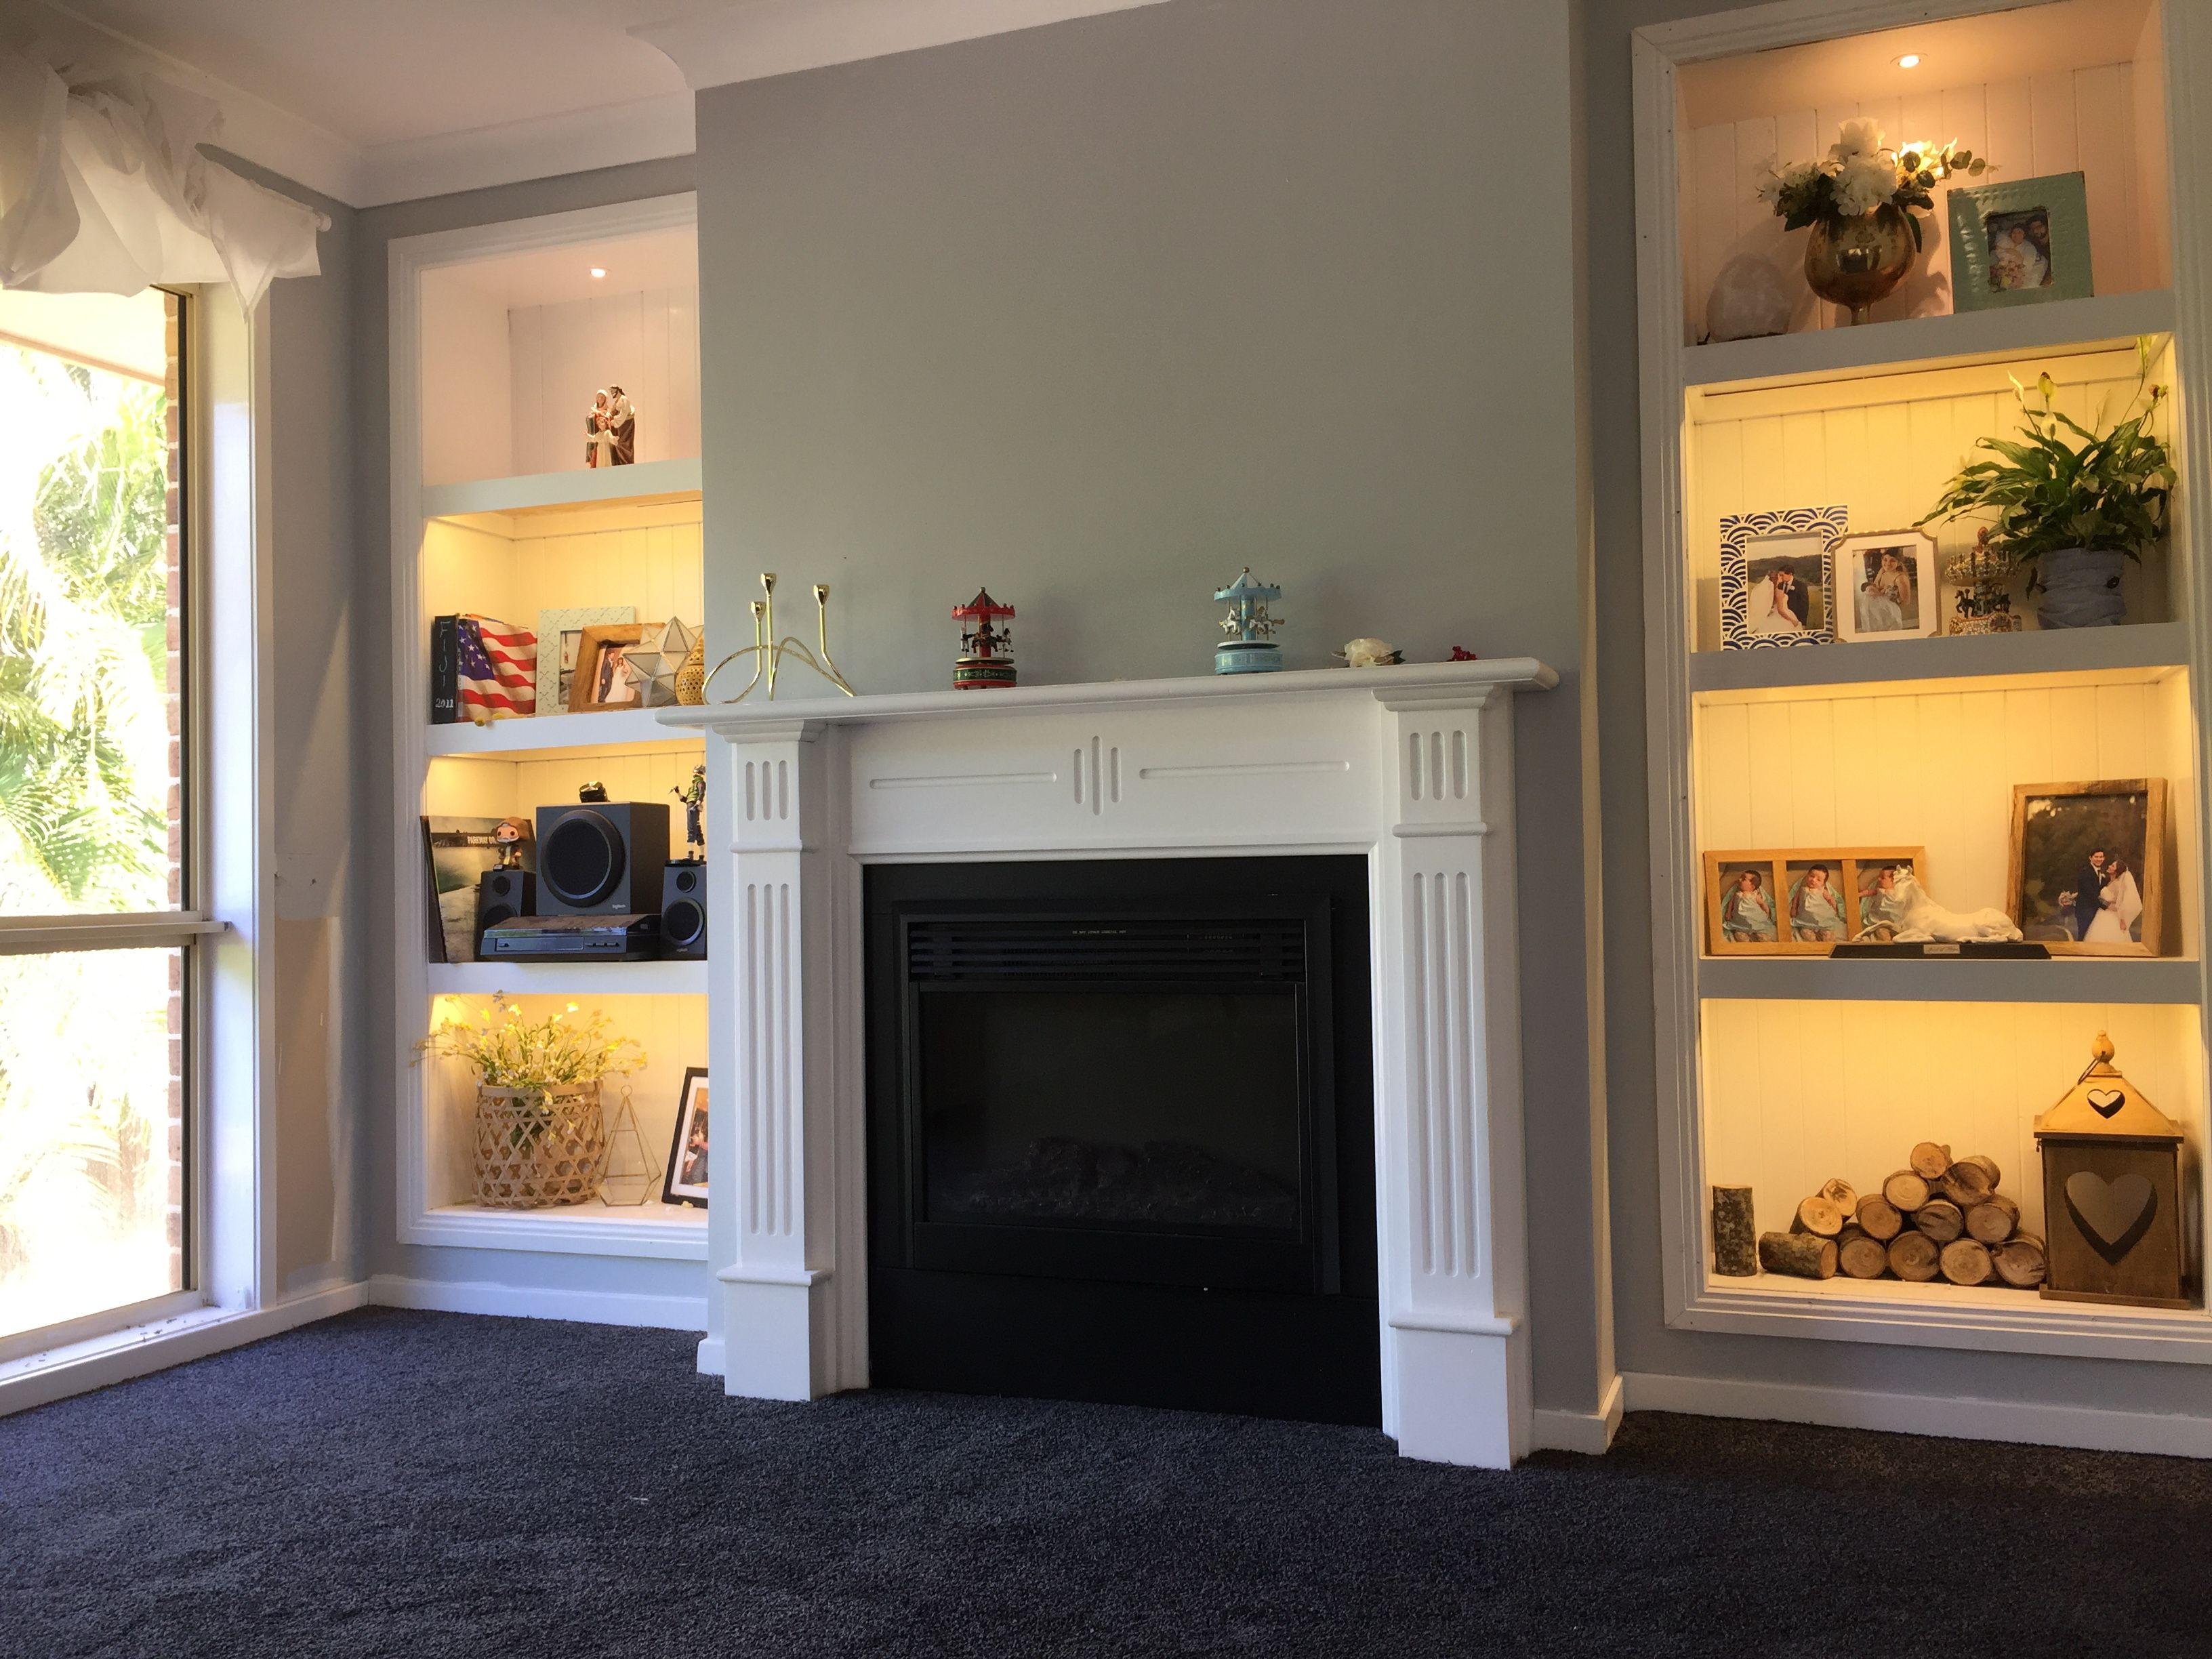 dark blue carpet grey walls electric fireplace built in shelves